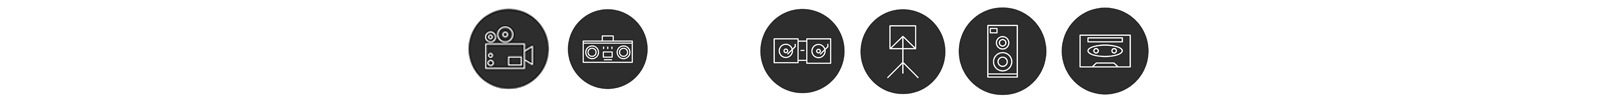 hip hop icon.jpg